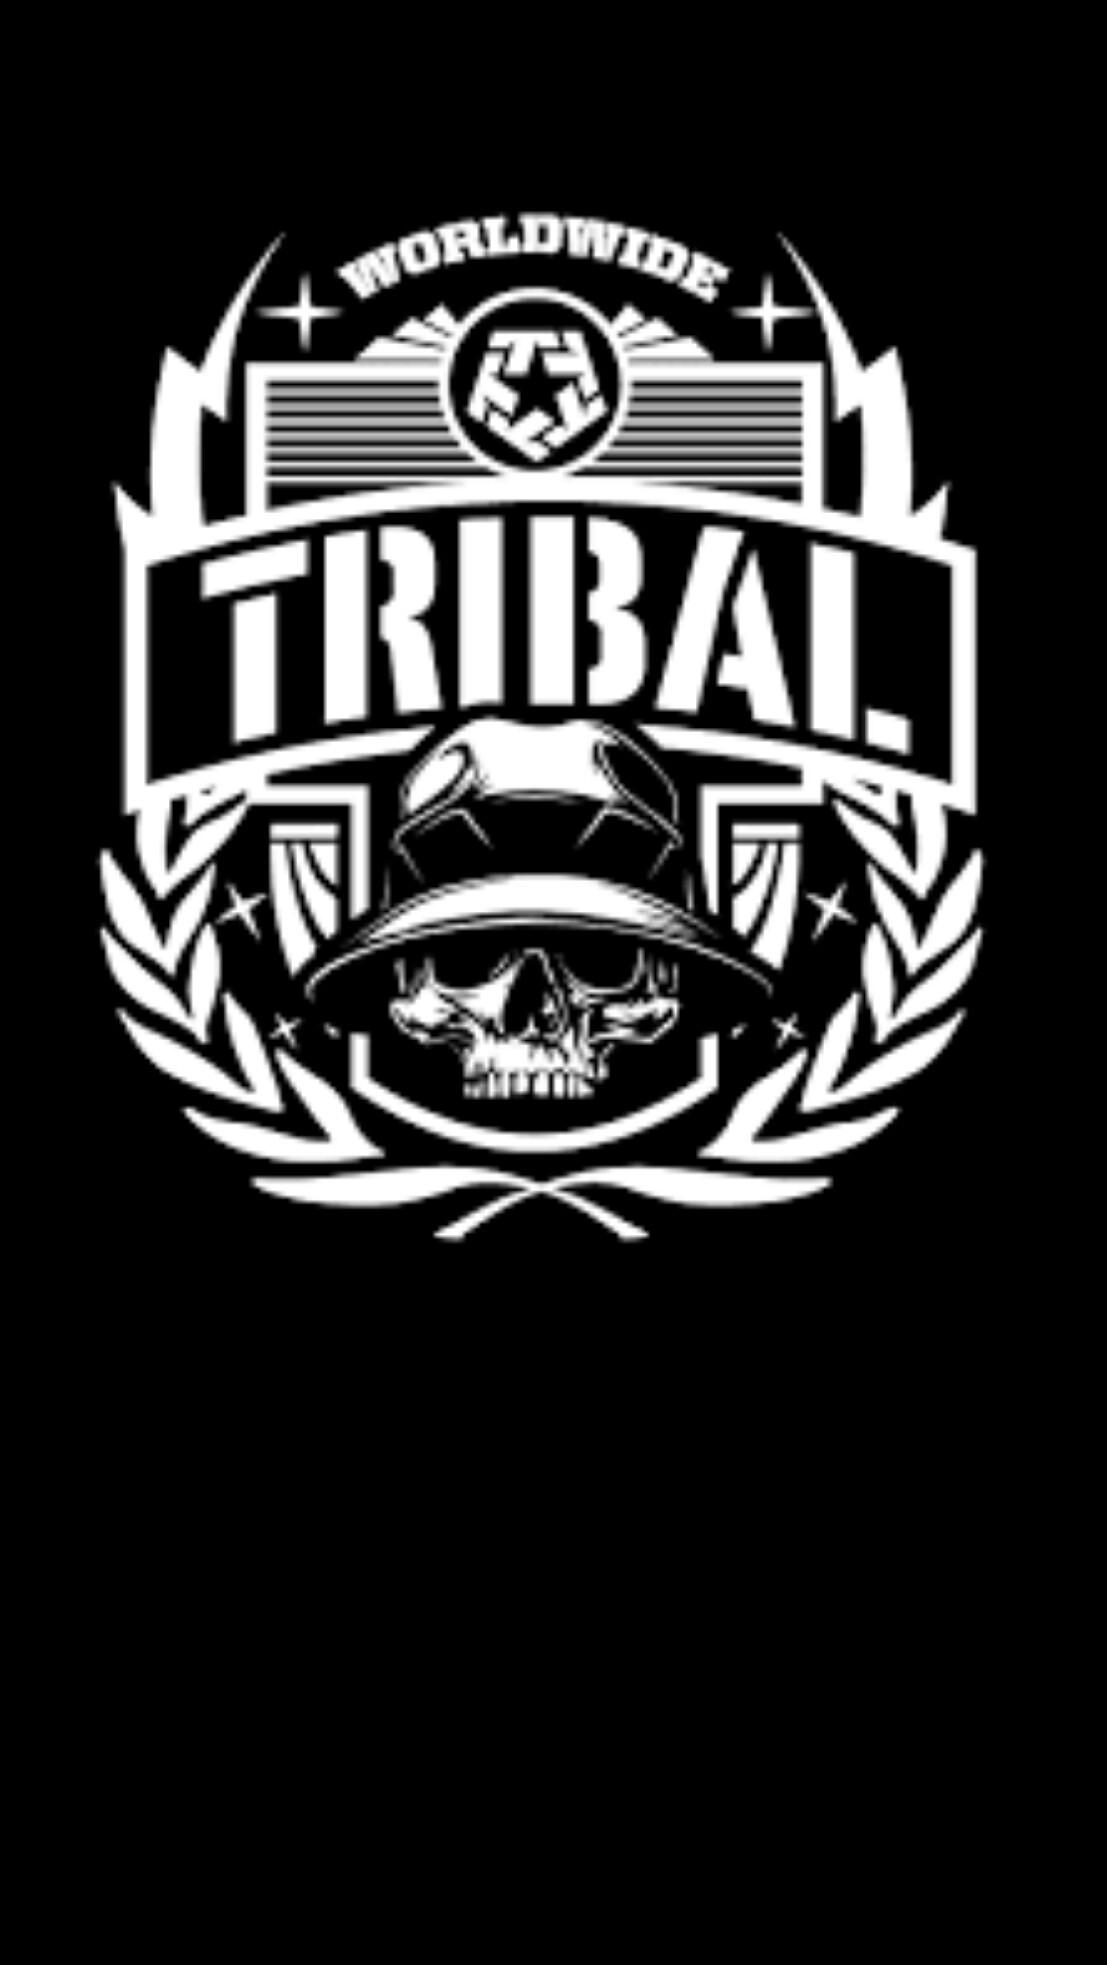 tribal gear hd wallpaper 64 images